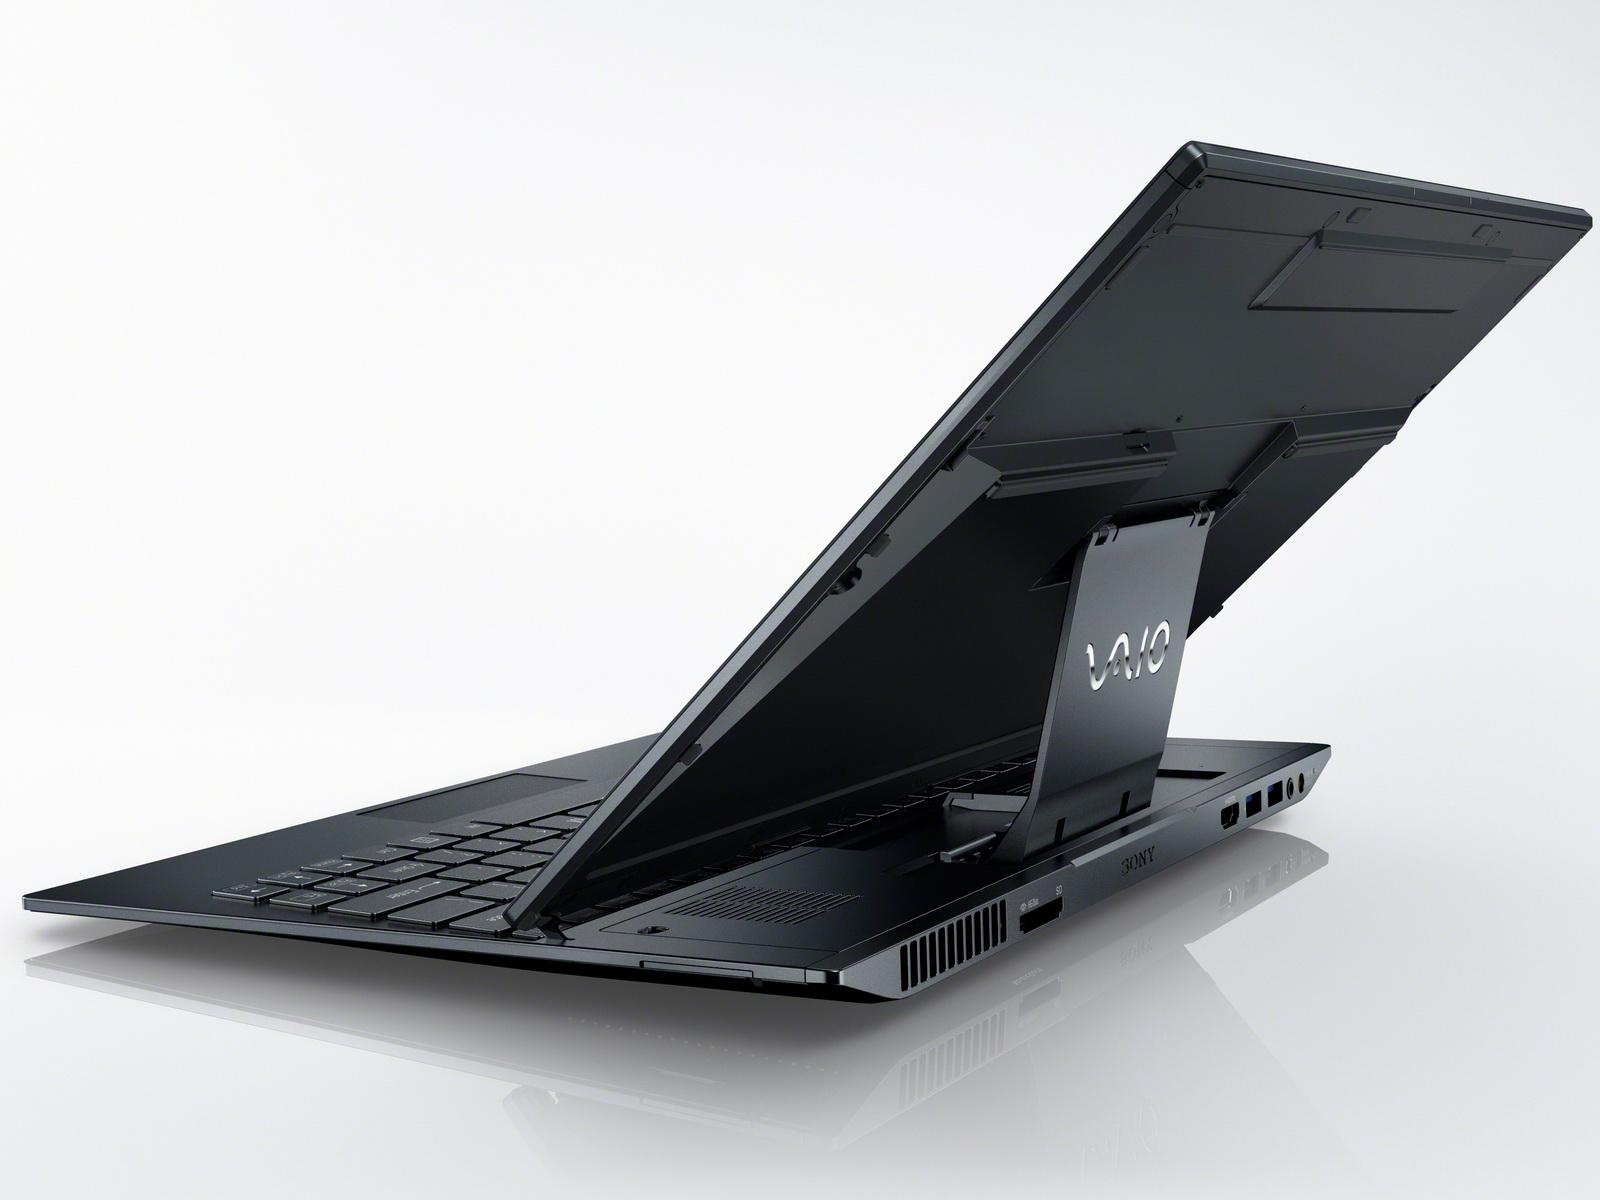 Sony Vaio Duo 13 Hybrid Ultrabook Mit Haswell Im Surf